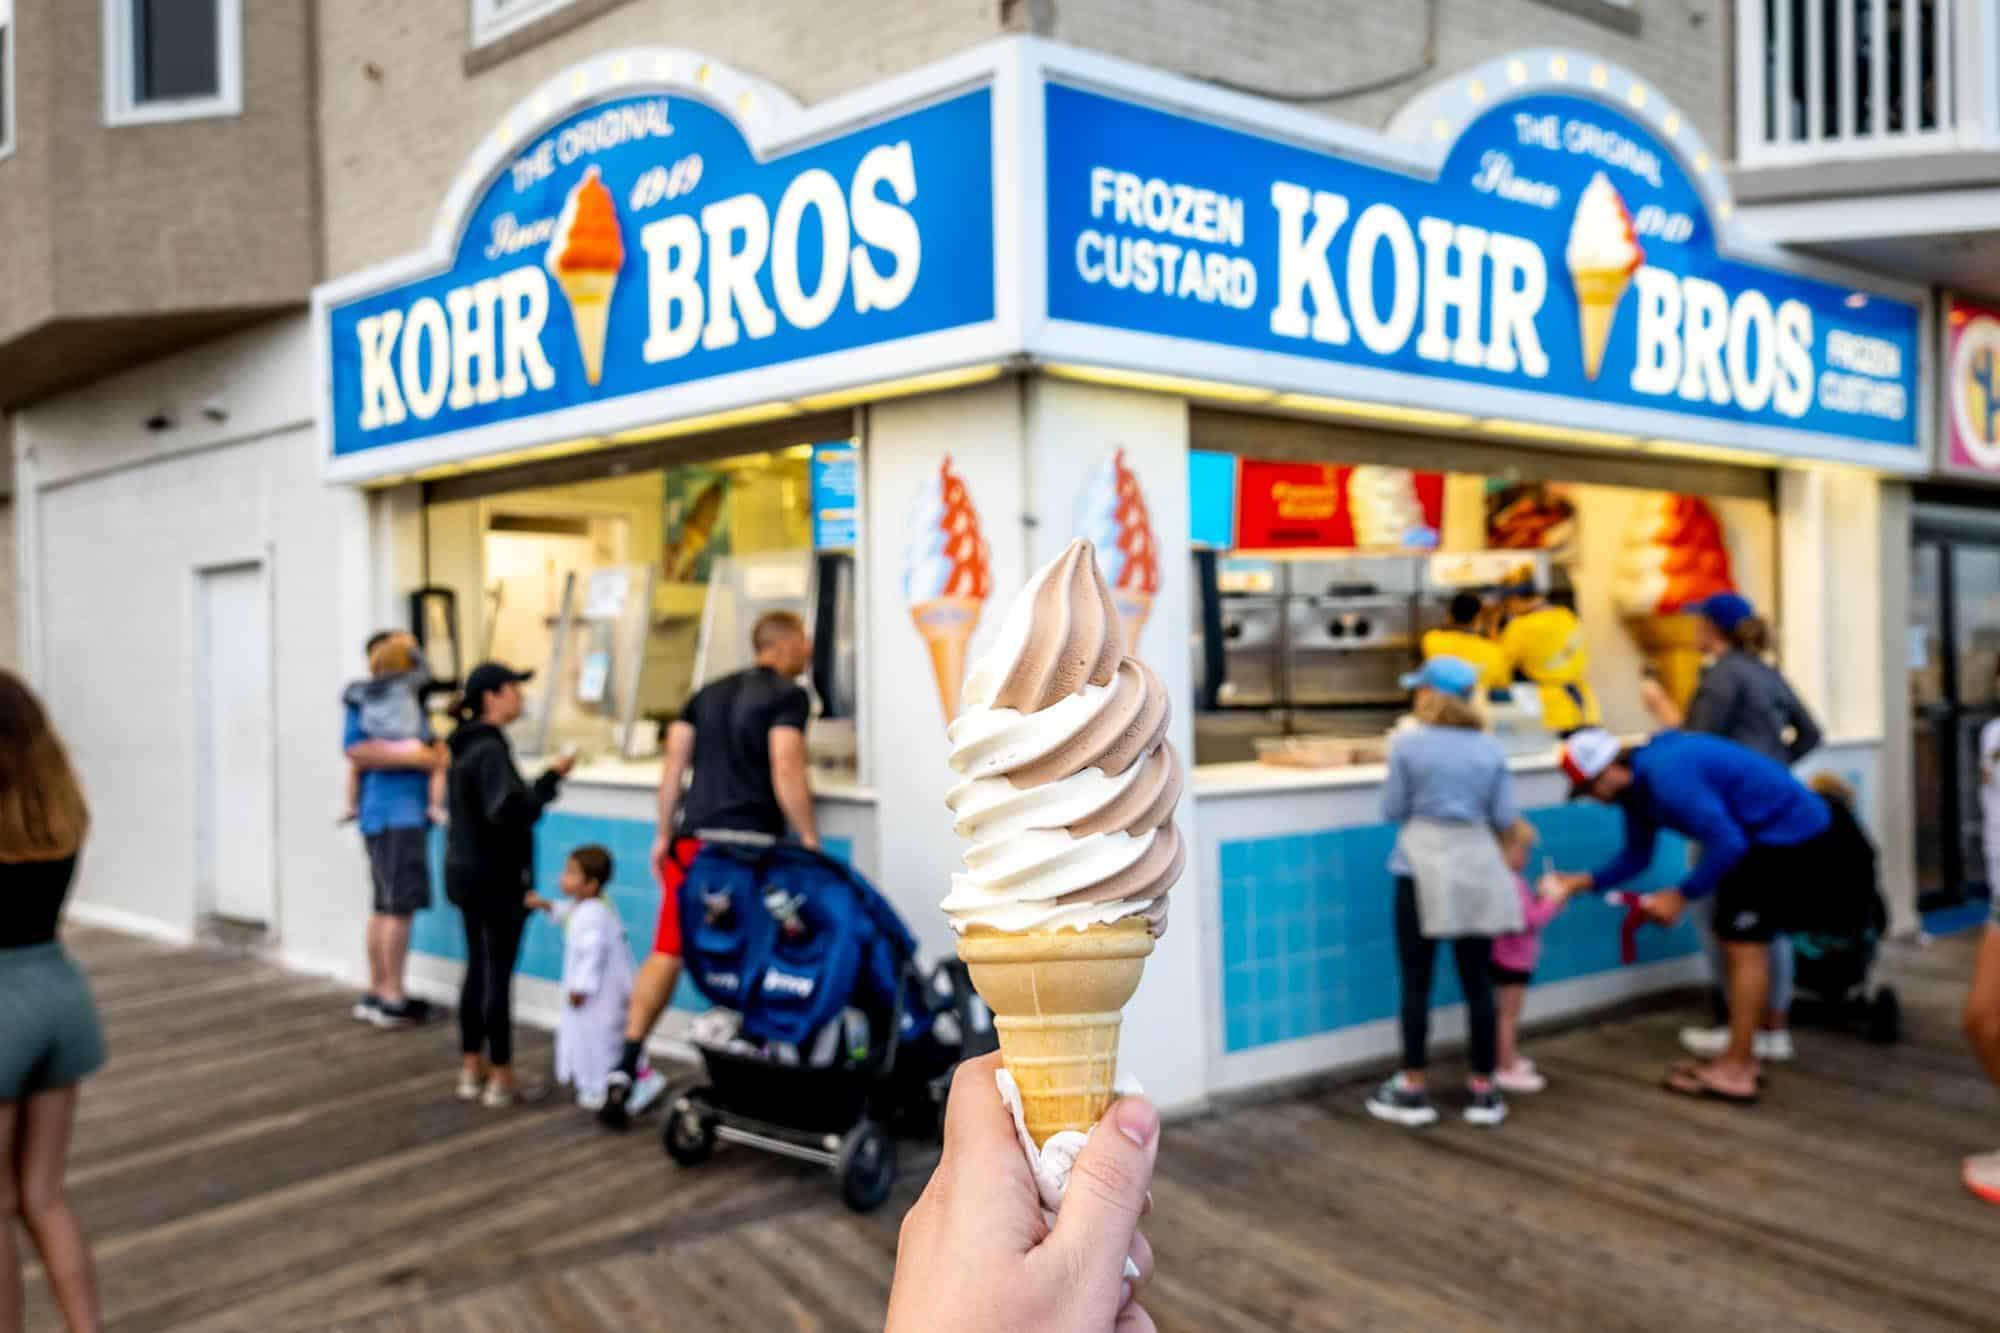 Frozen custard in front of Kohr Bros store